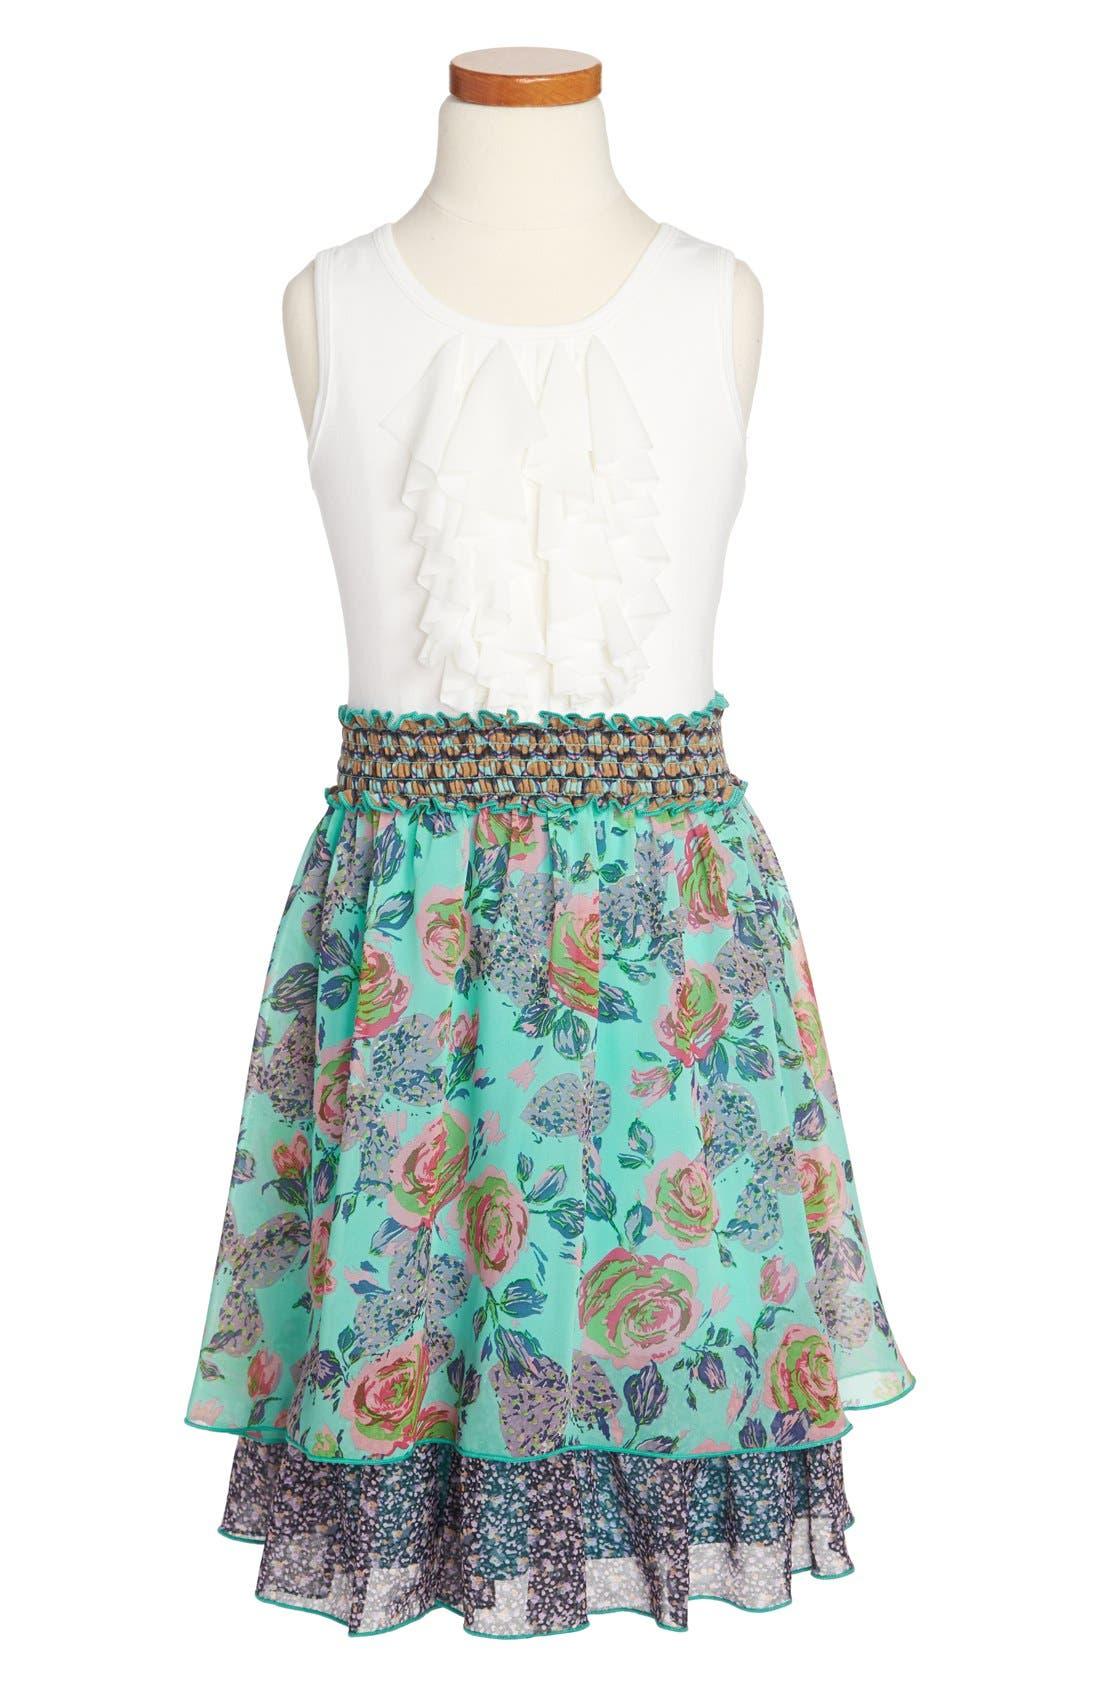 Alternate Image 1 Selected - Truly Me 'Media' Smocked Waist Dress (Big Girls)